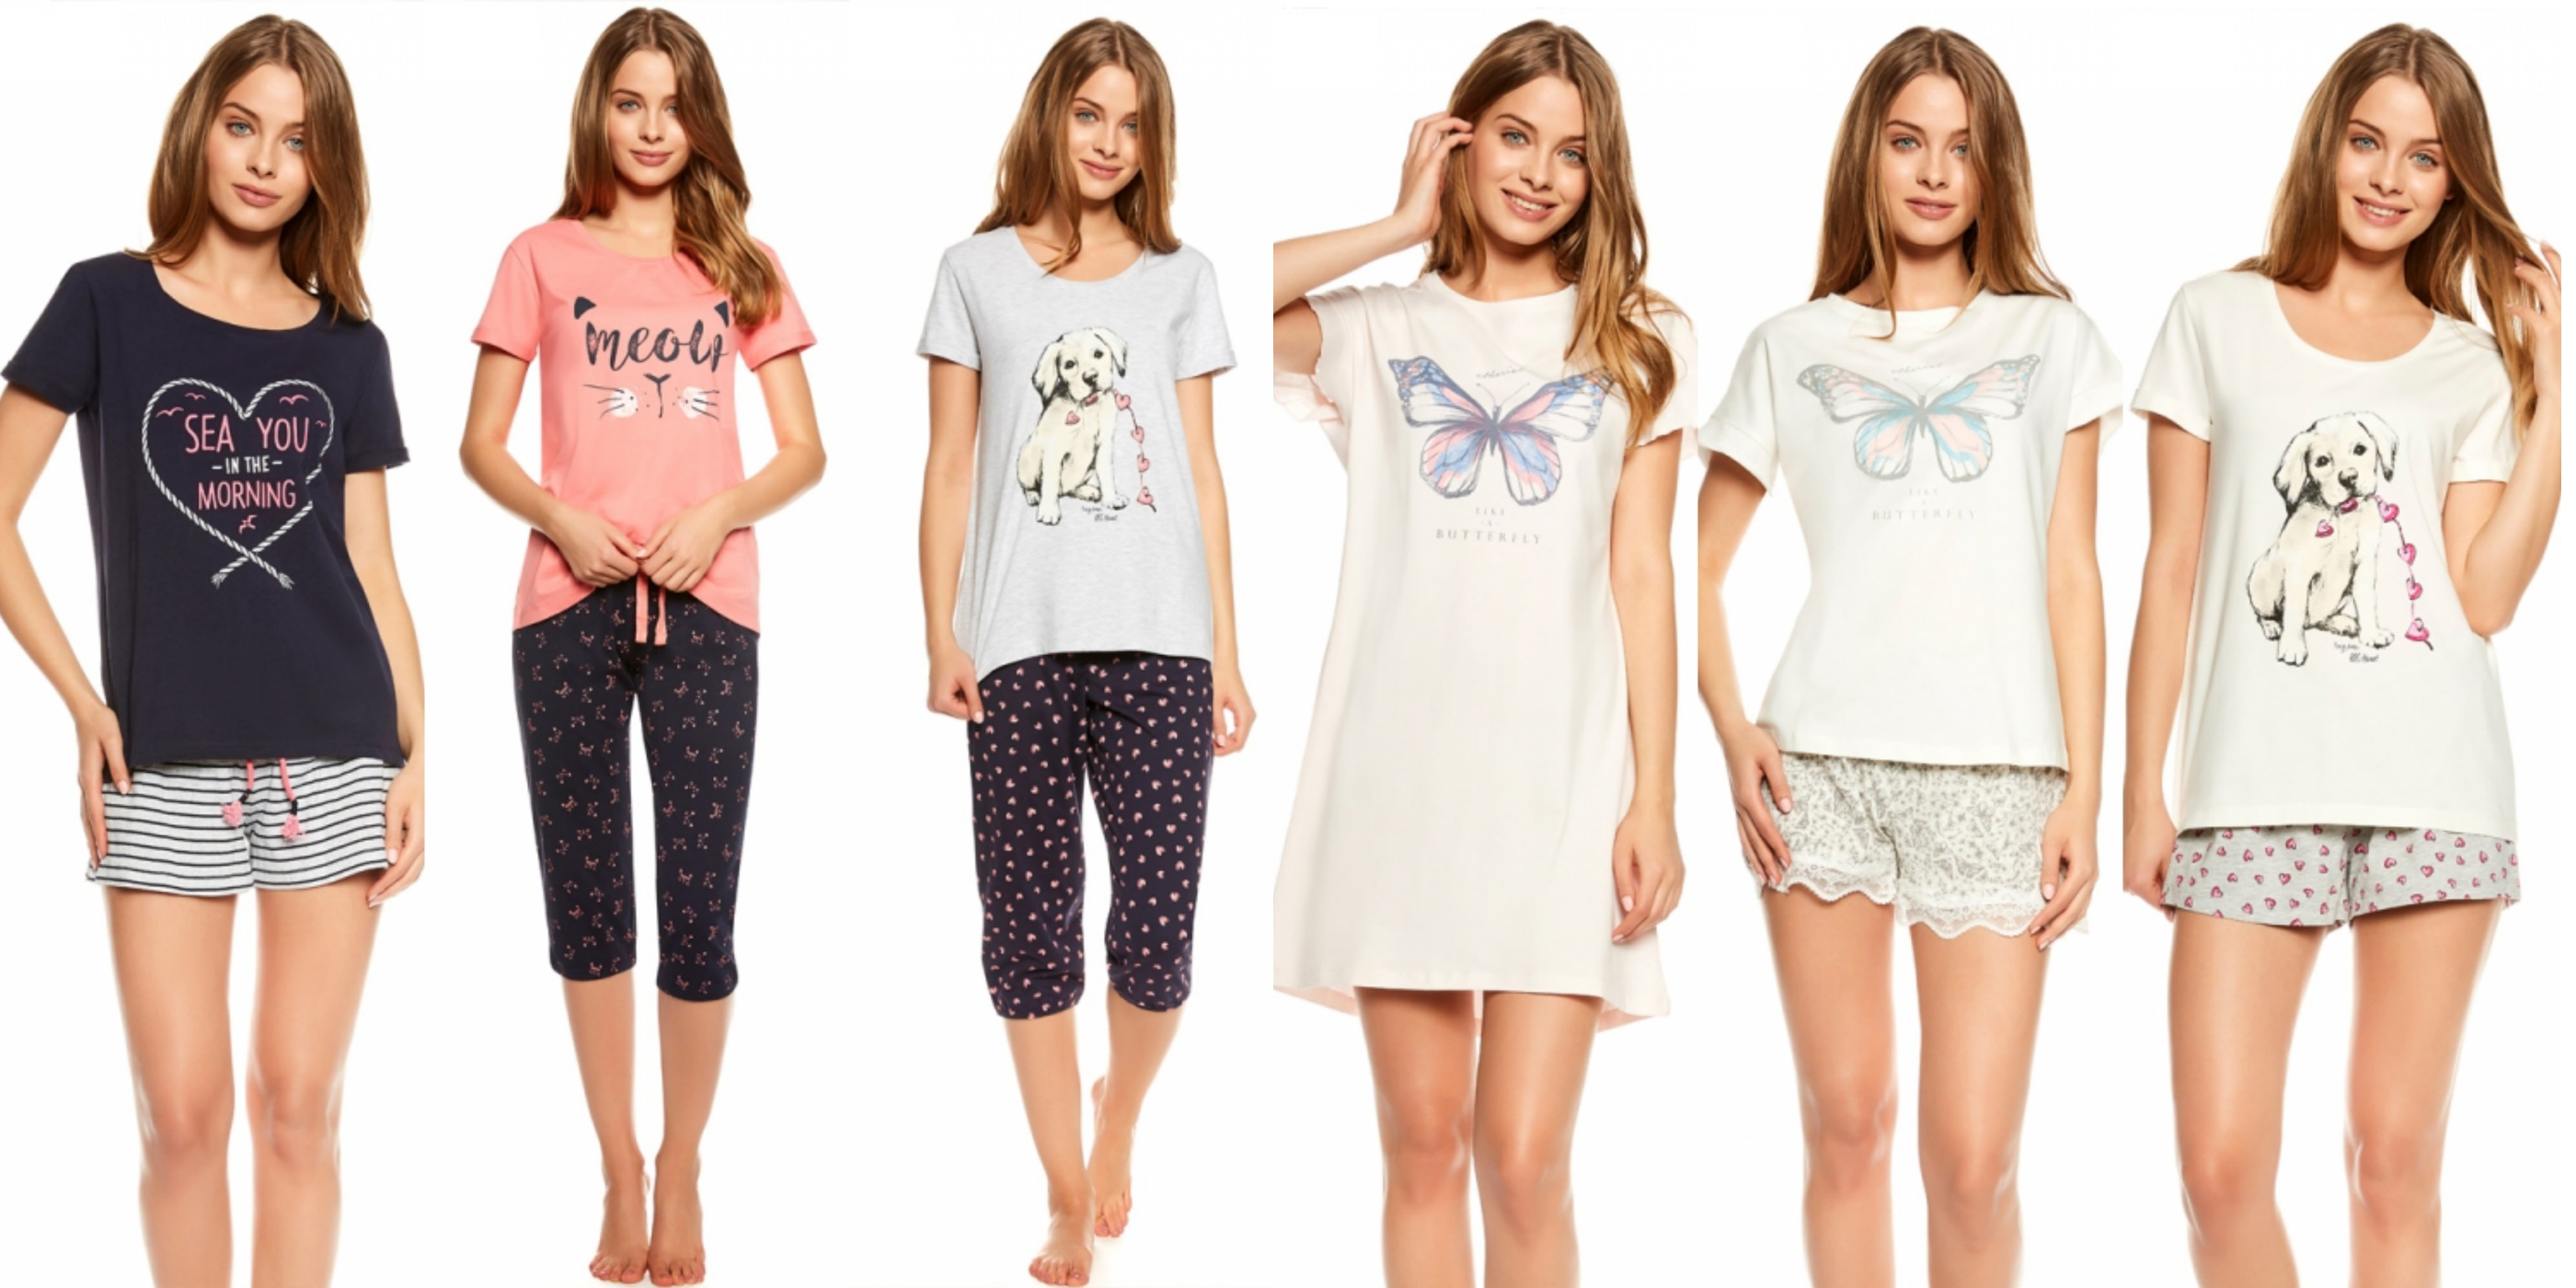 Henderson Ladies пижамы купить